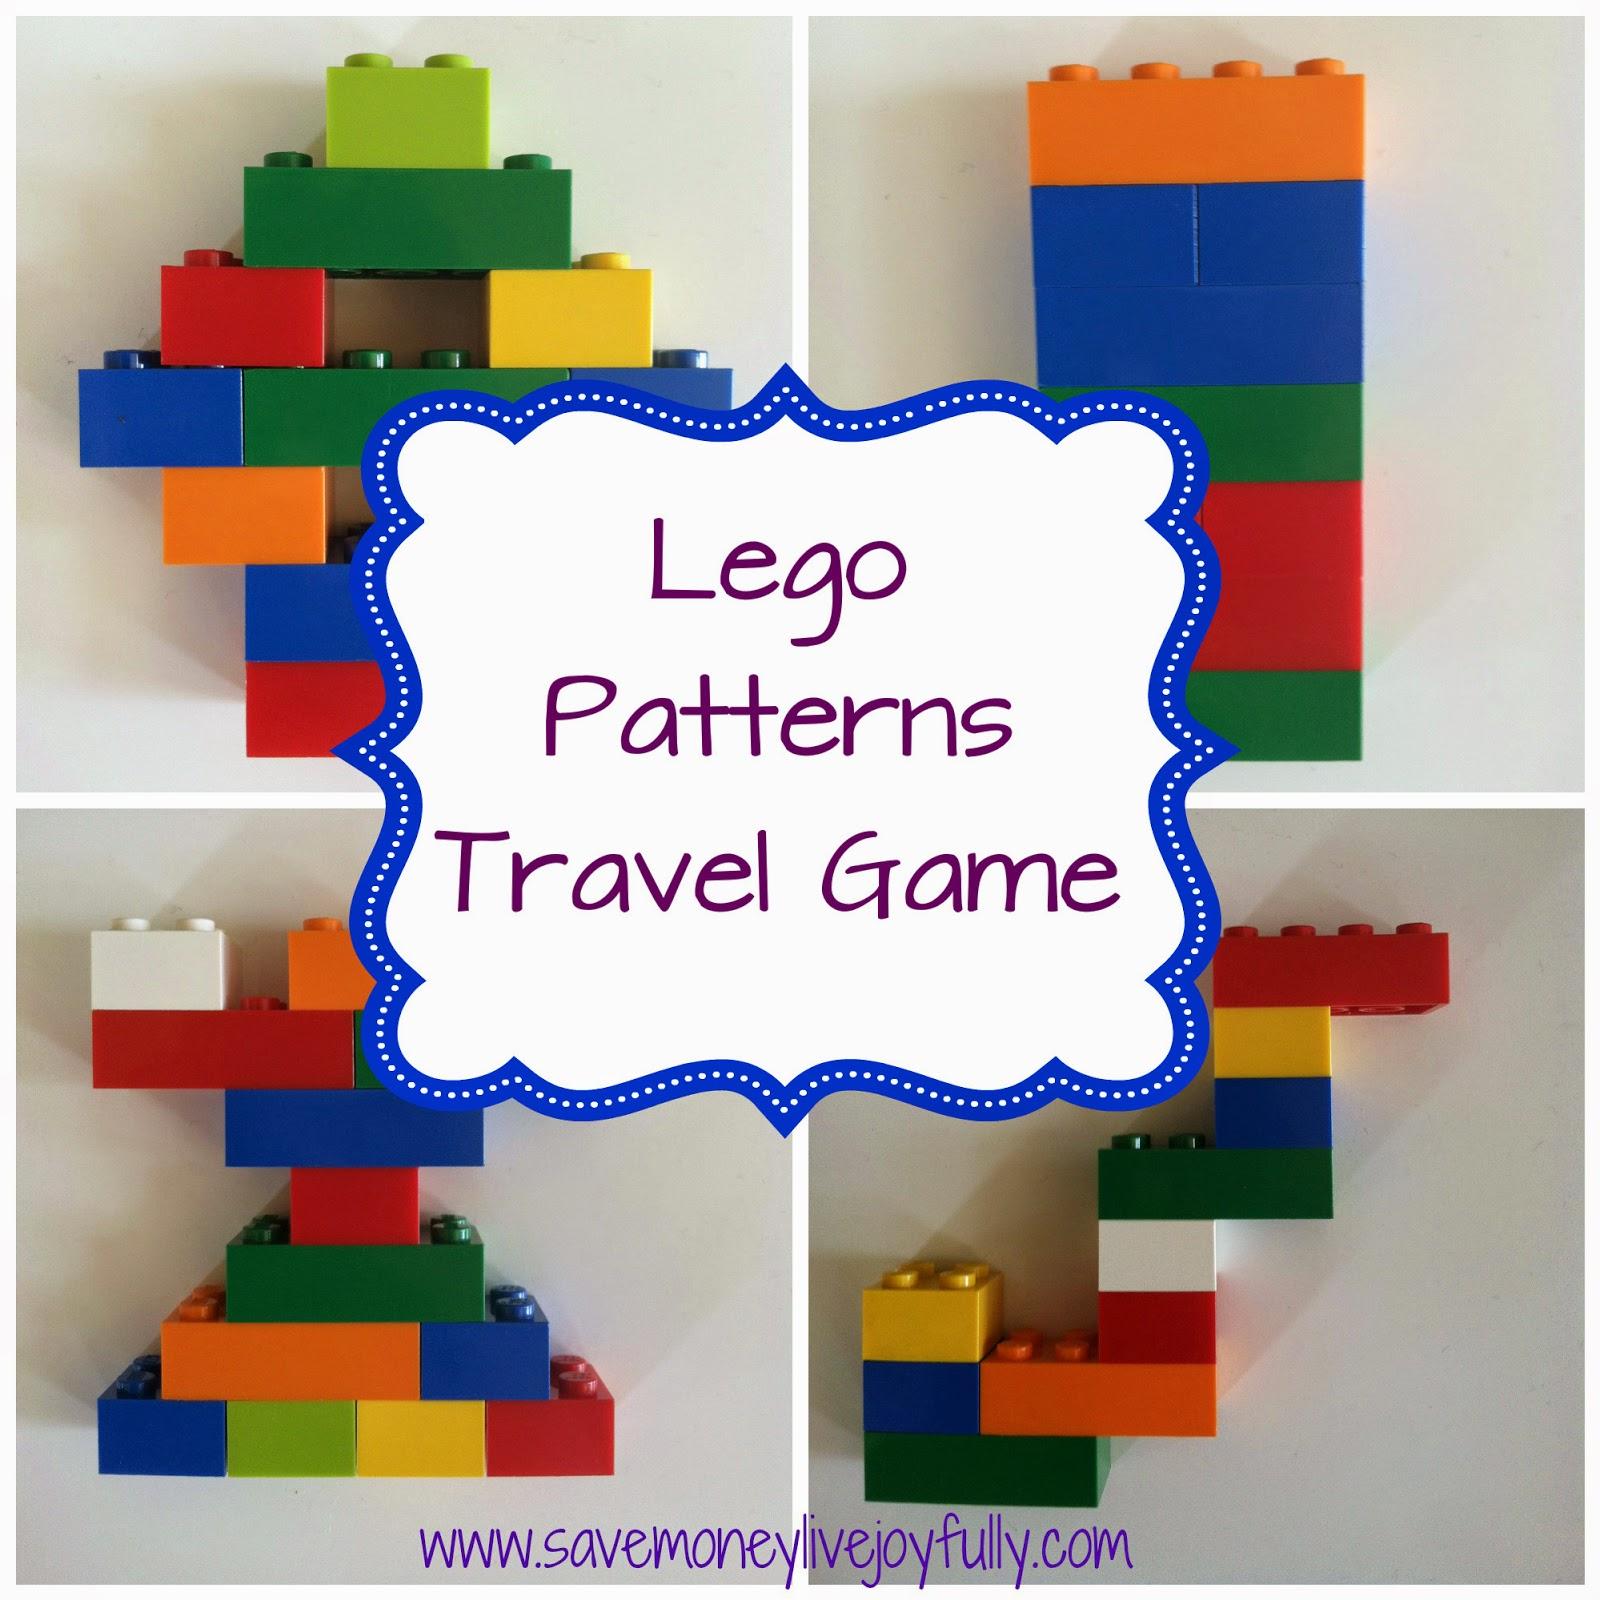 Save Money Live Joyfully Lego Patterns Travel Game Free